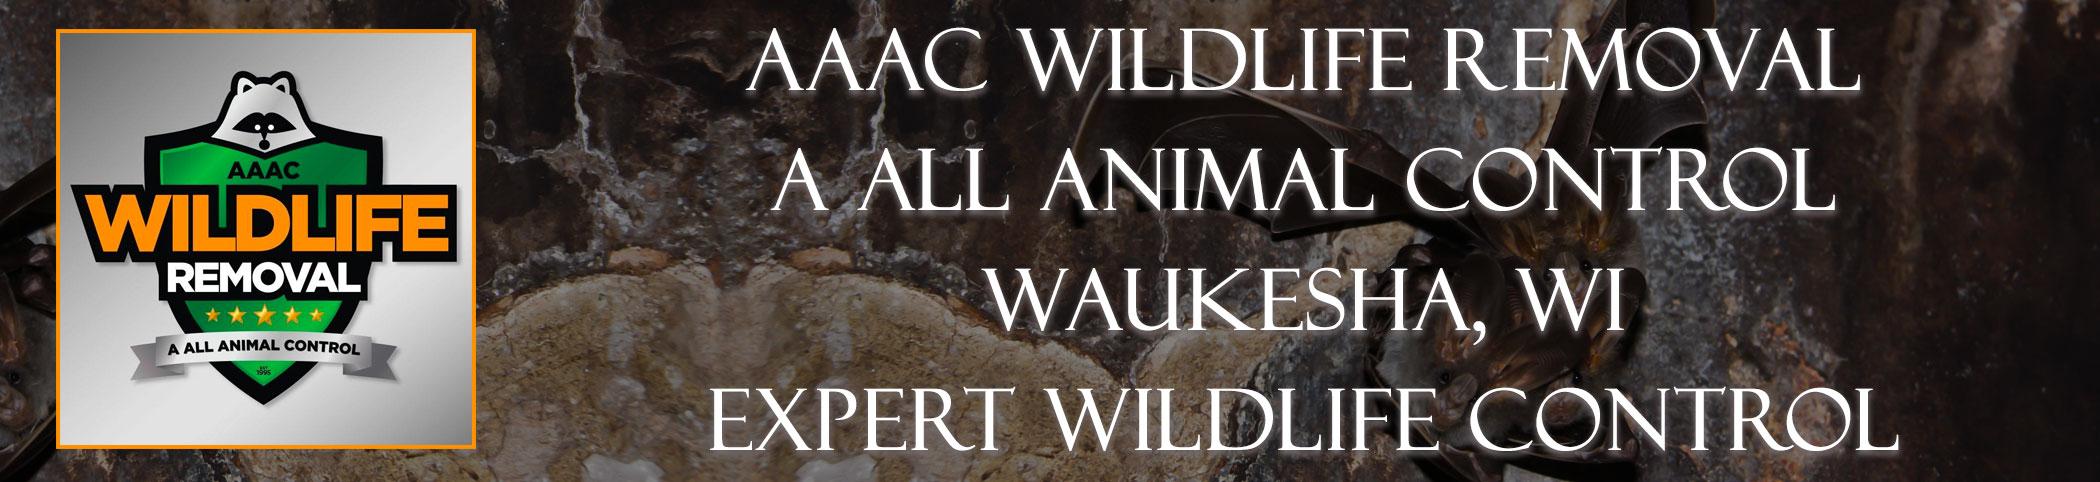 aaac-wildlife-removal-Waukesha-wisconsin